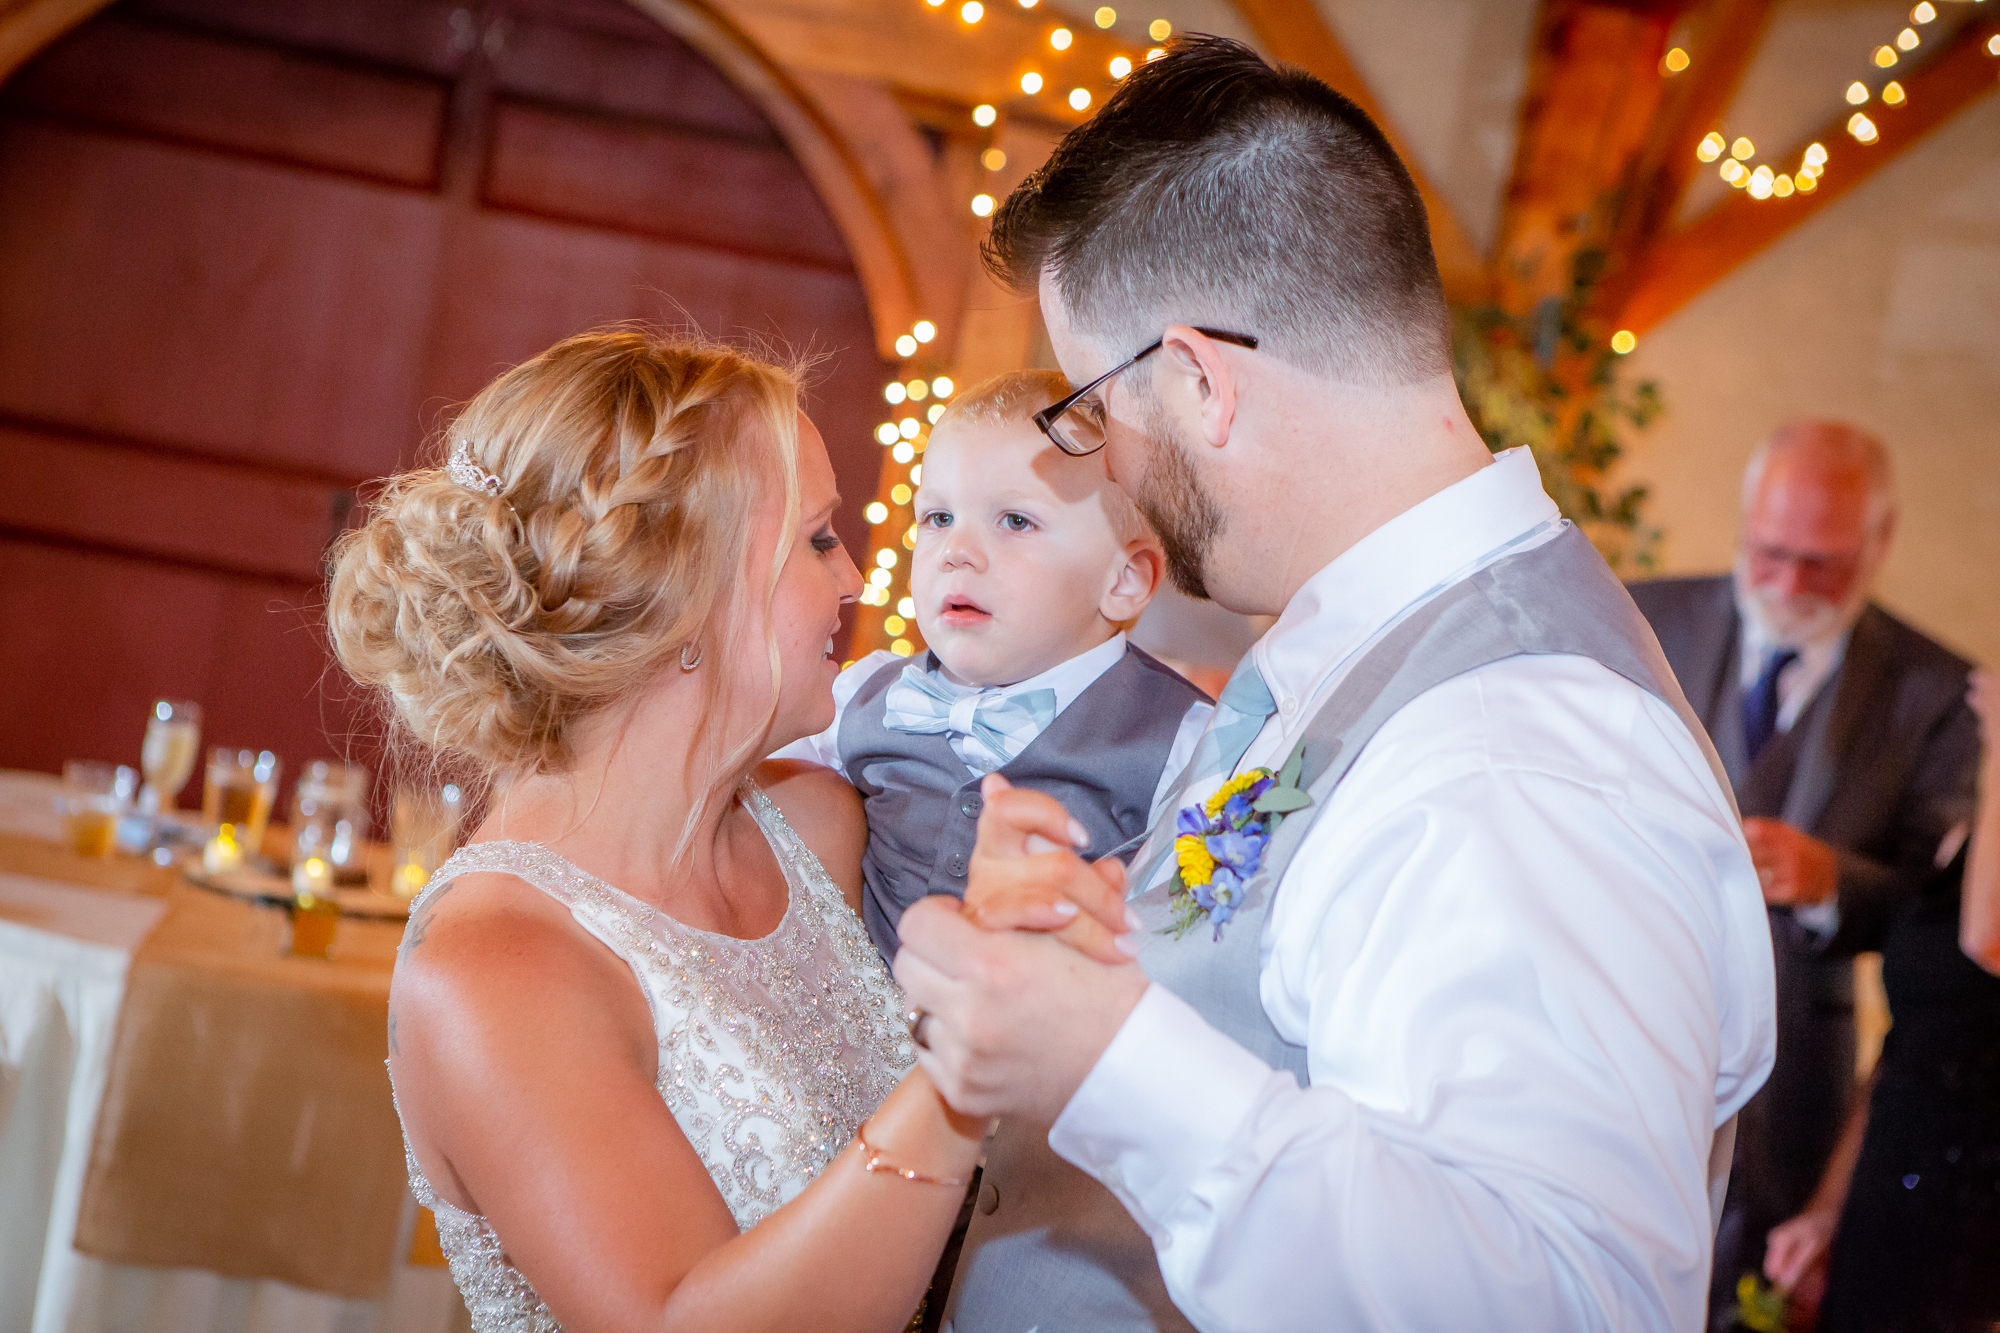 Wedding-Carriage-House-Oneonta-NY-0907.jpg